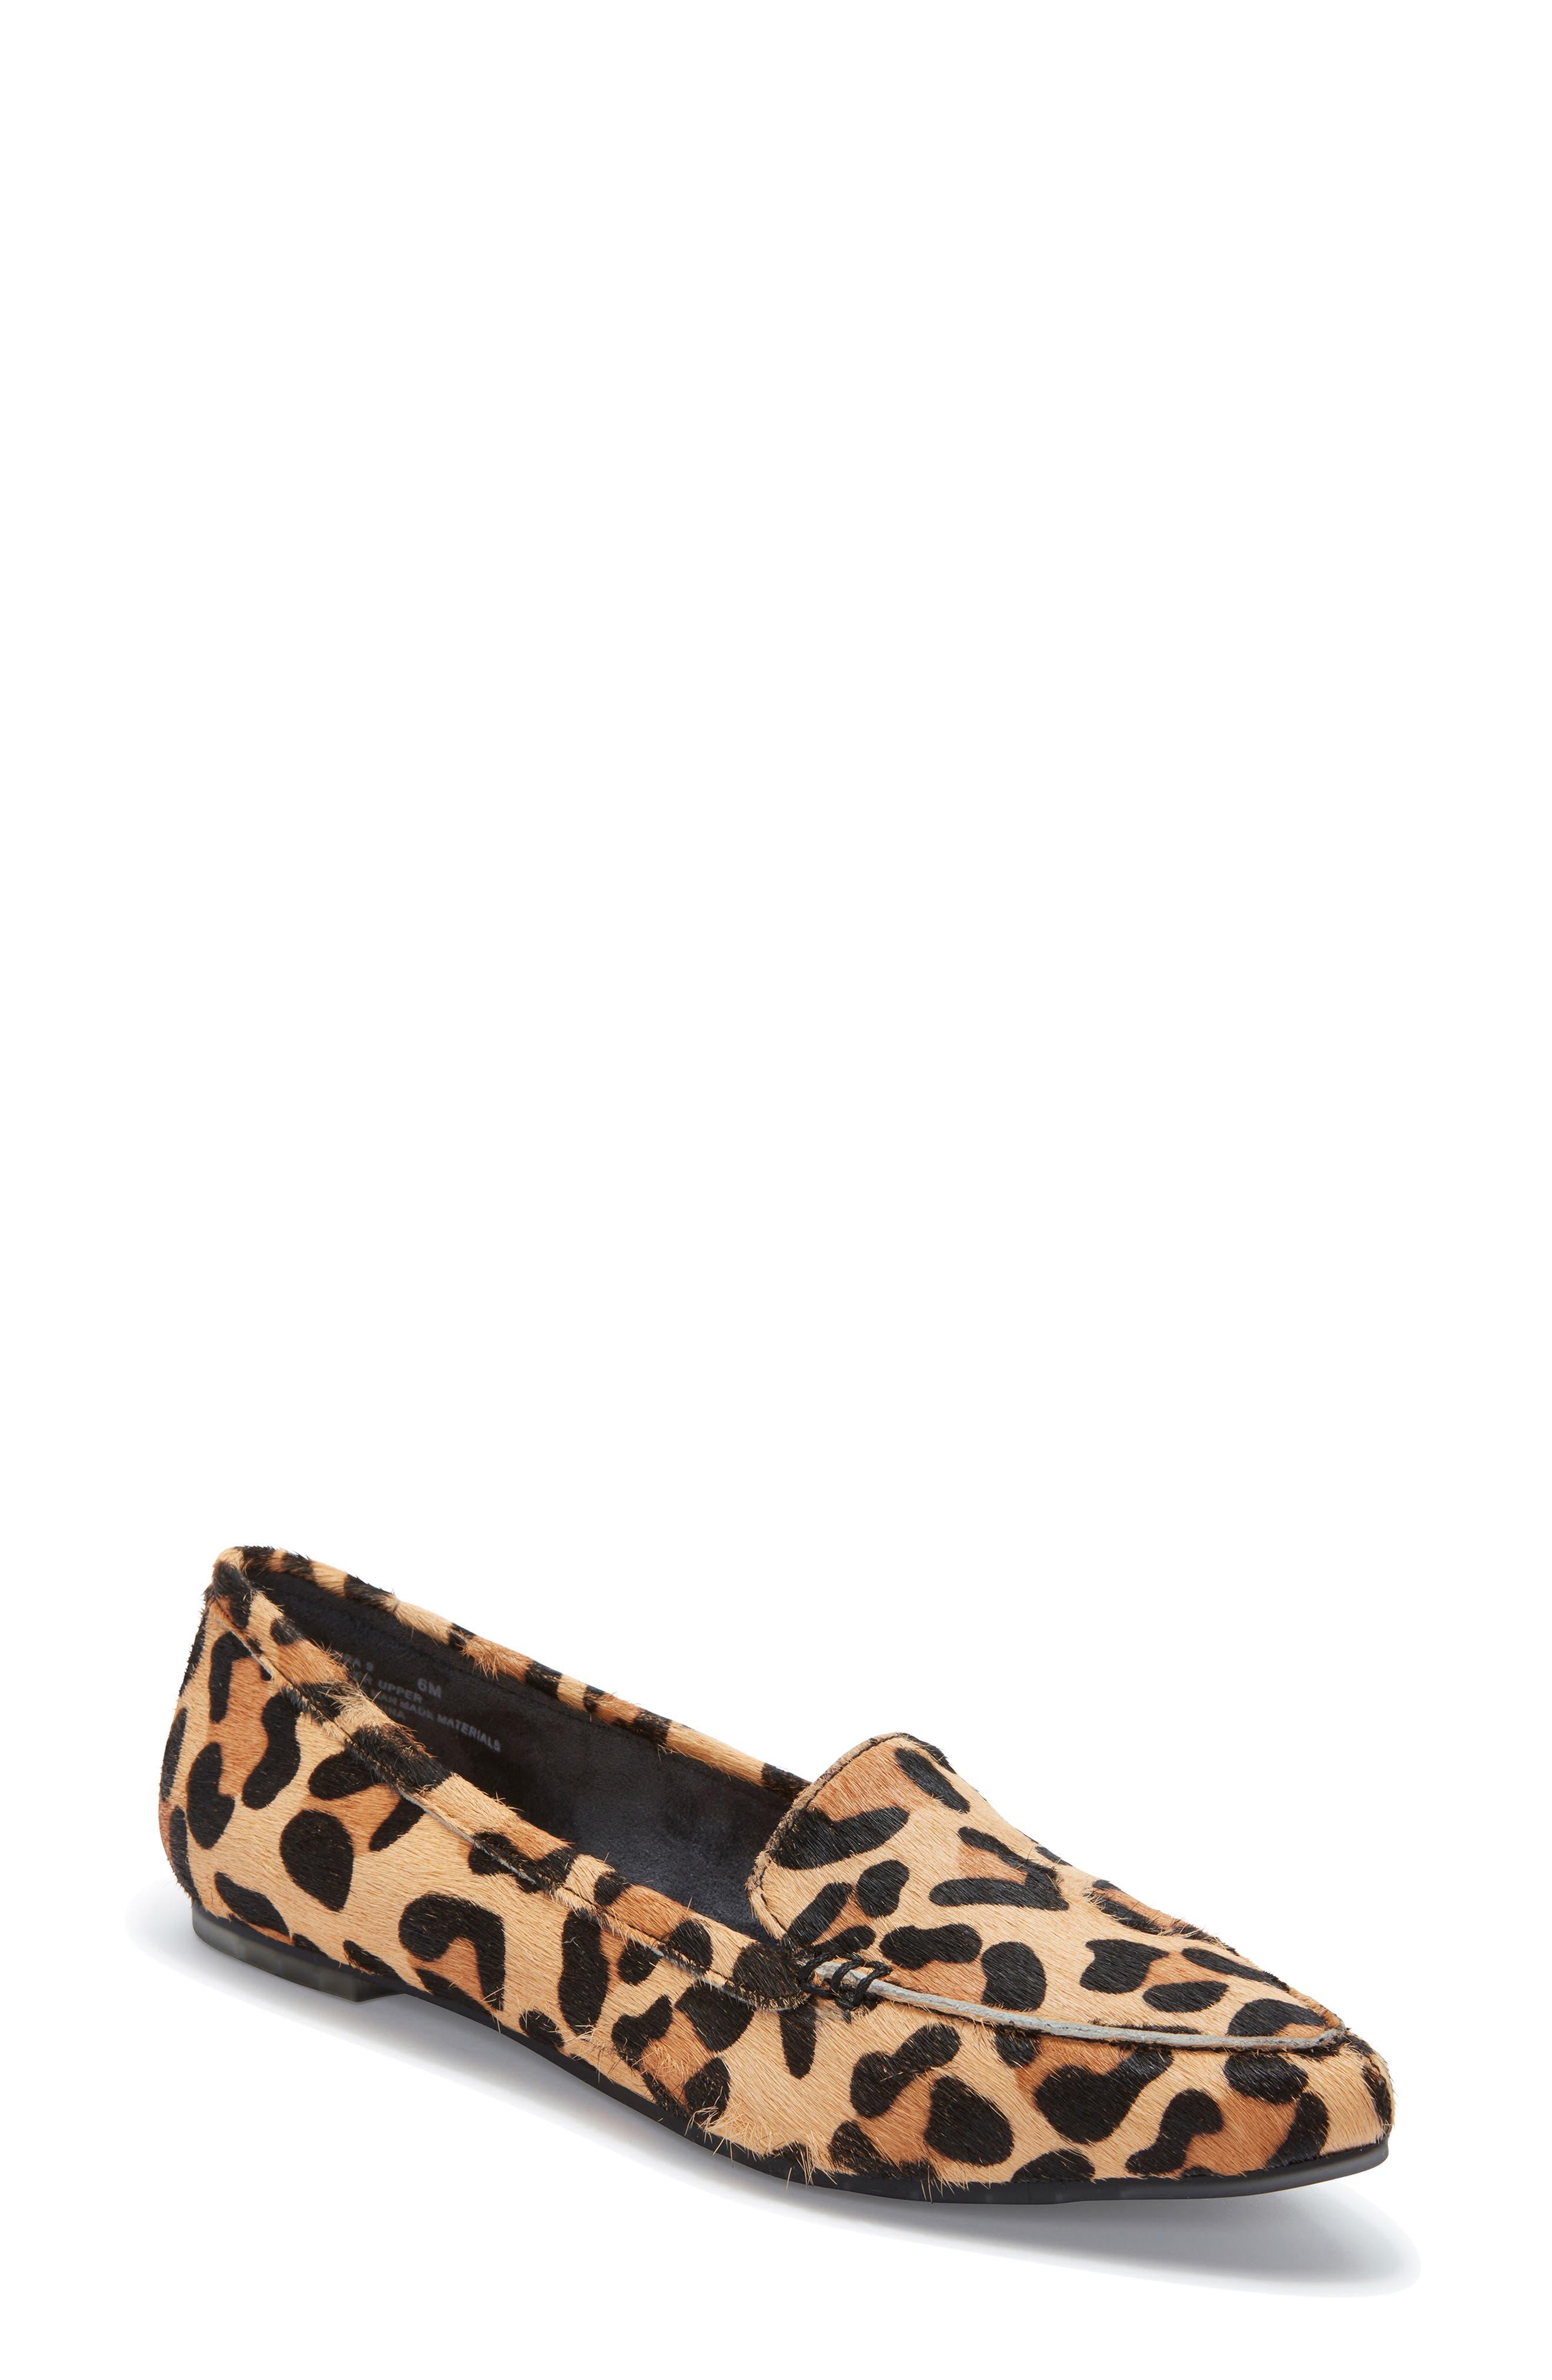 Me Too Audra Genuine Calf Hair Loafer Flat- Beige